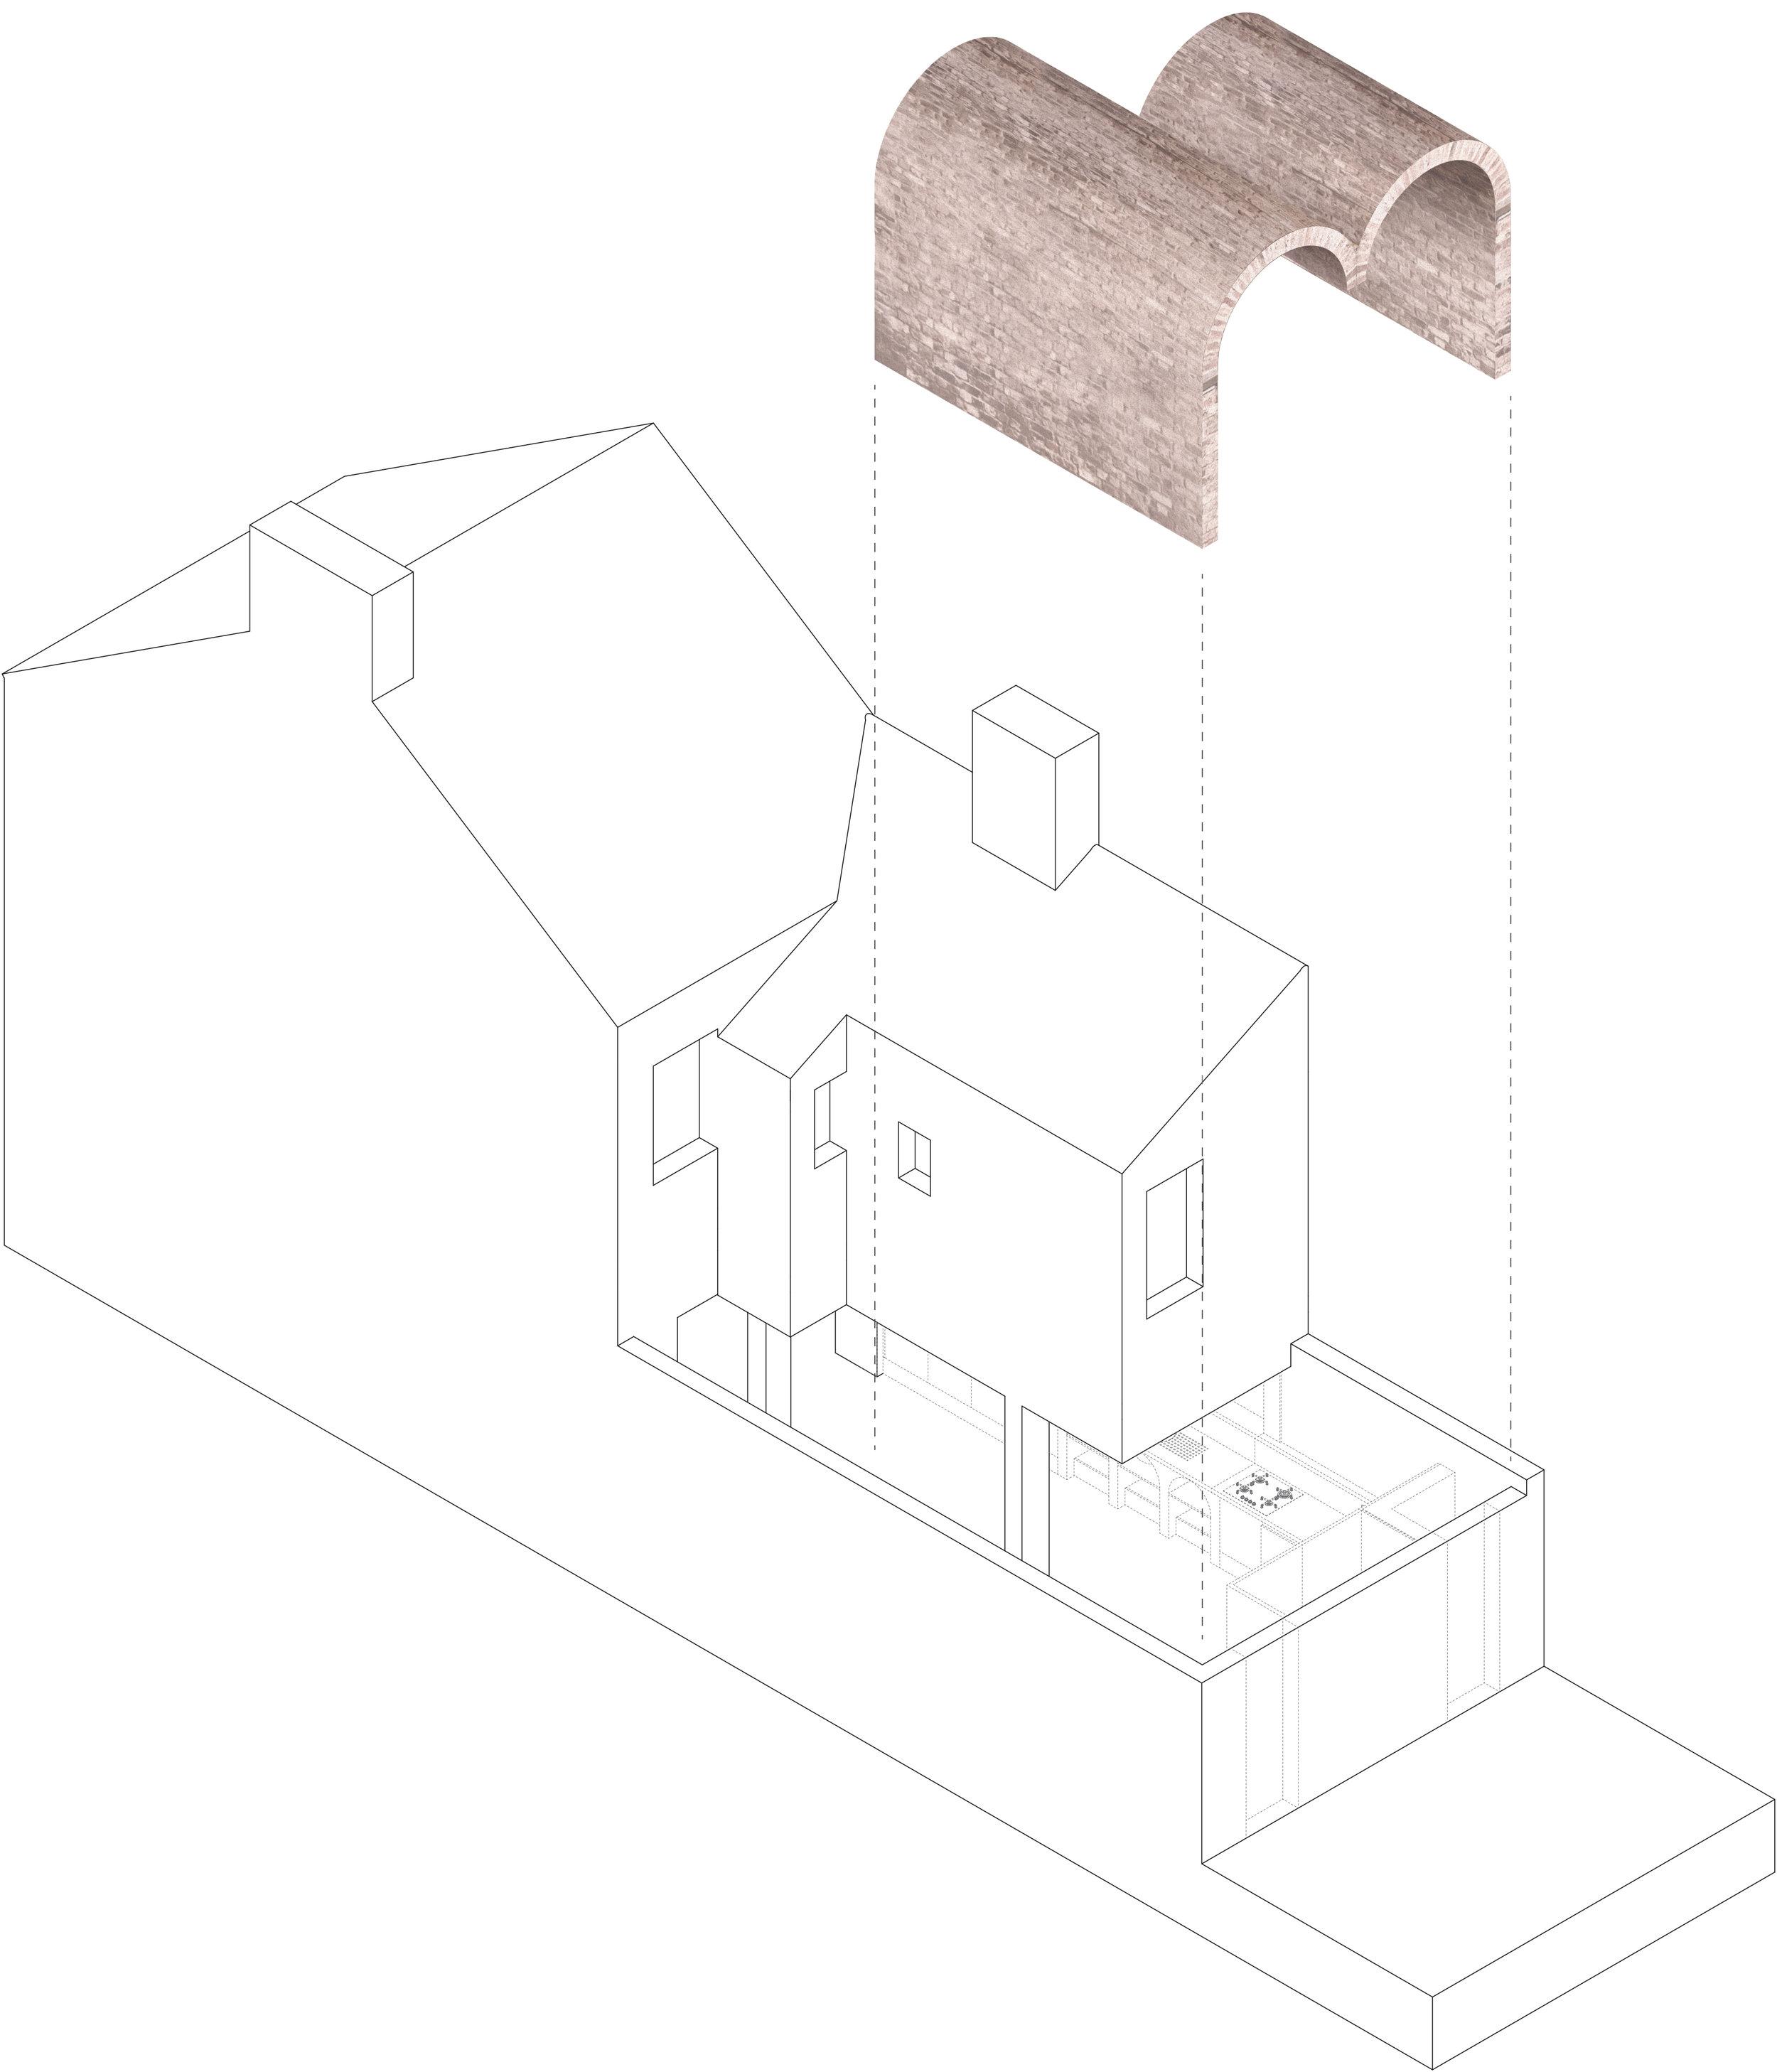 16 SBA vault house - vault diagram.jpg